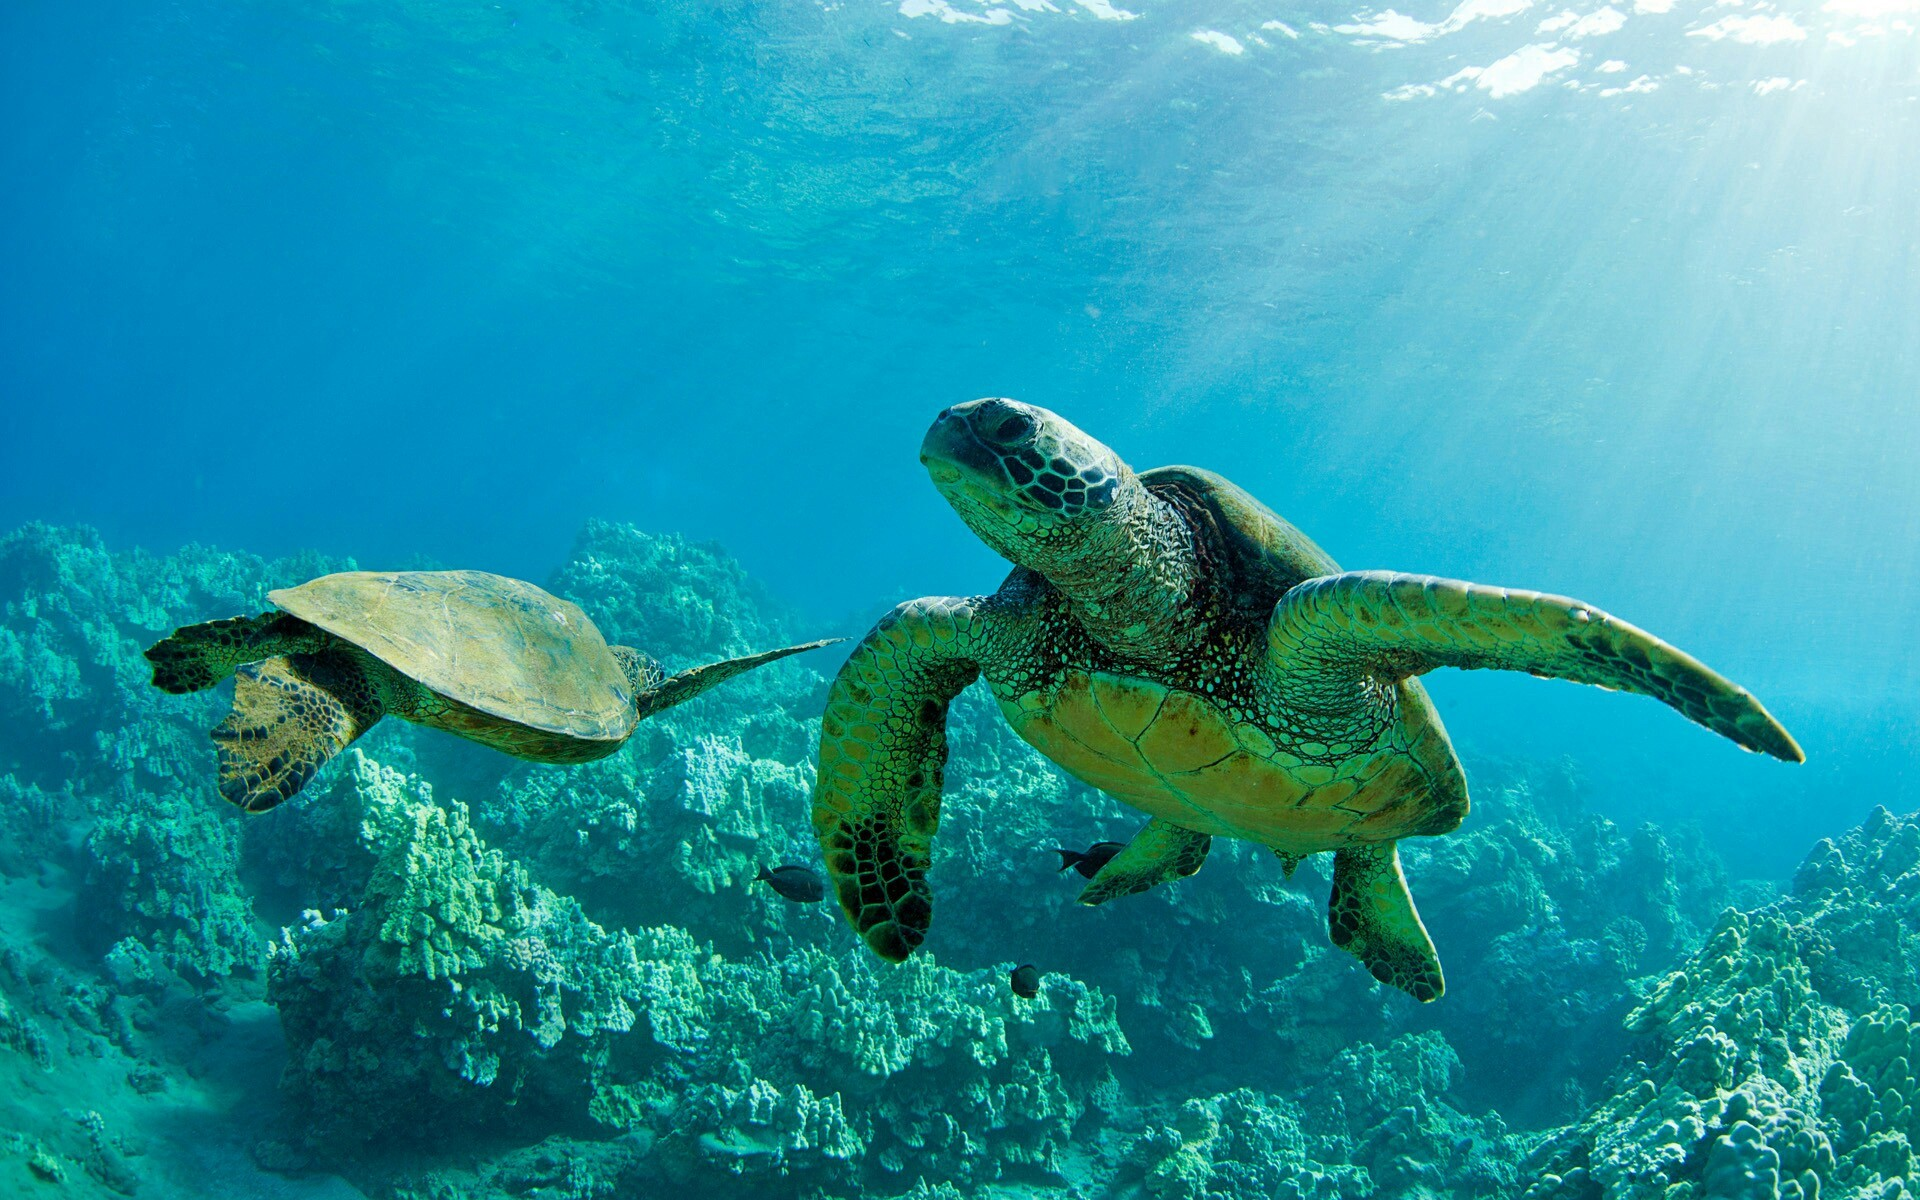 Turtle · SeacTurtles · Windows WallpaperWallpaper BackgroundsDesktop  WallpapersWater TurtlesSea …